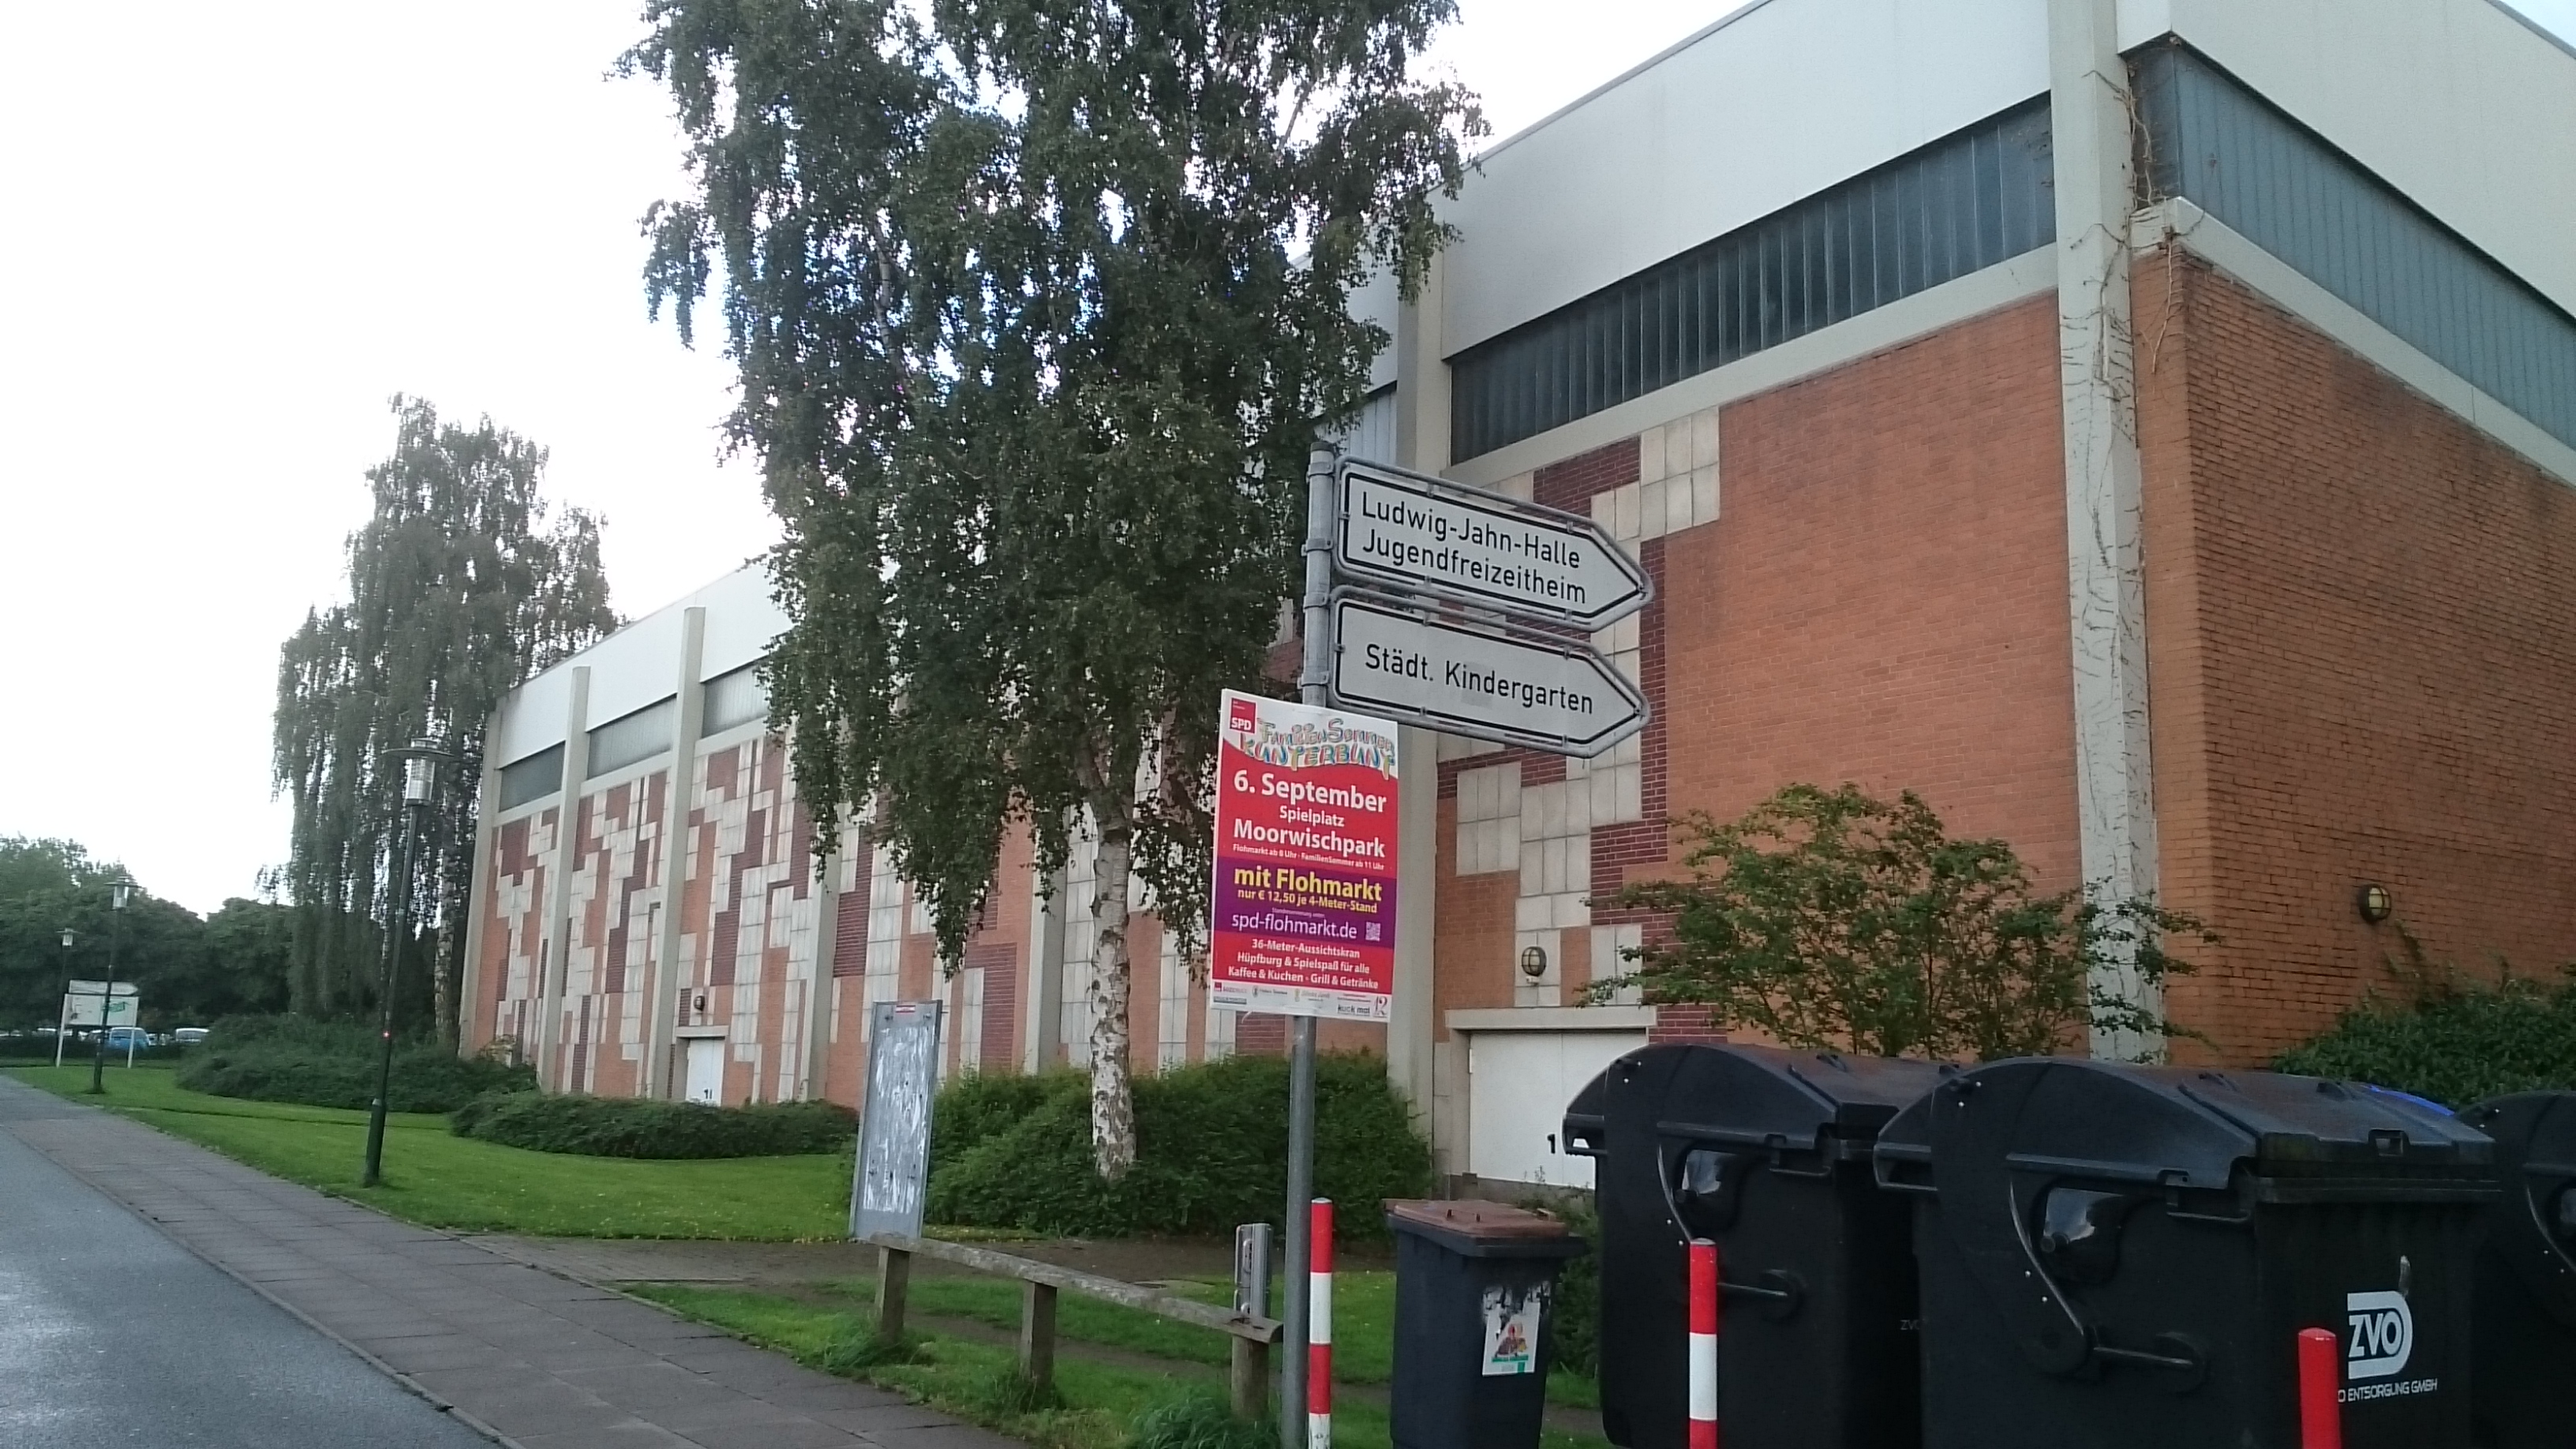 Sporthallen in Ludwig-Jahn-Str. 7 23611 Bad Schwartau